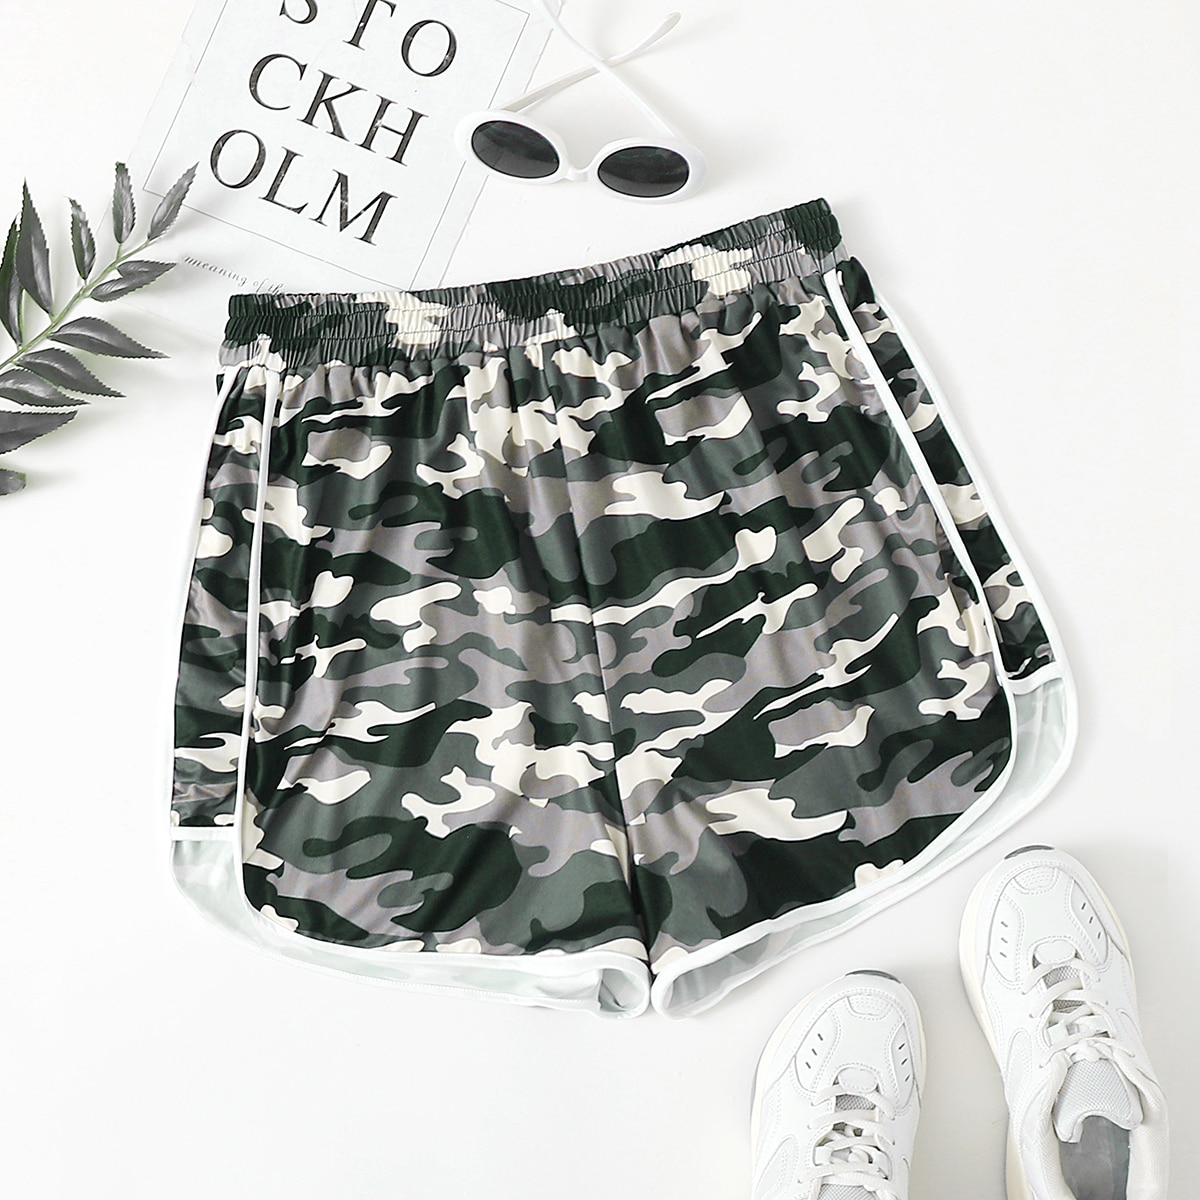 SHEIN Sport Camouflage Short grote maat Contrasterende Zomen